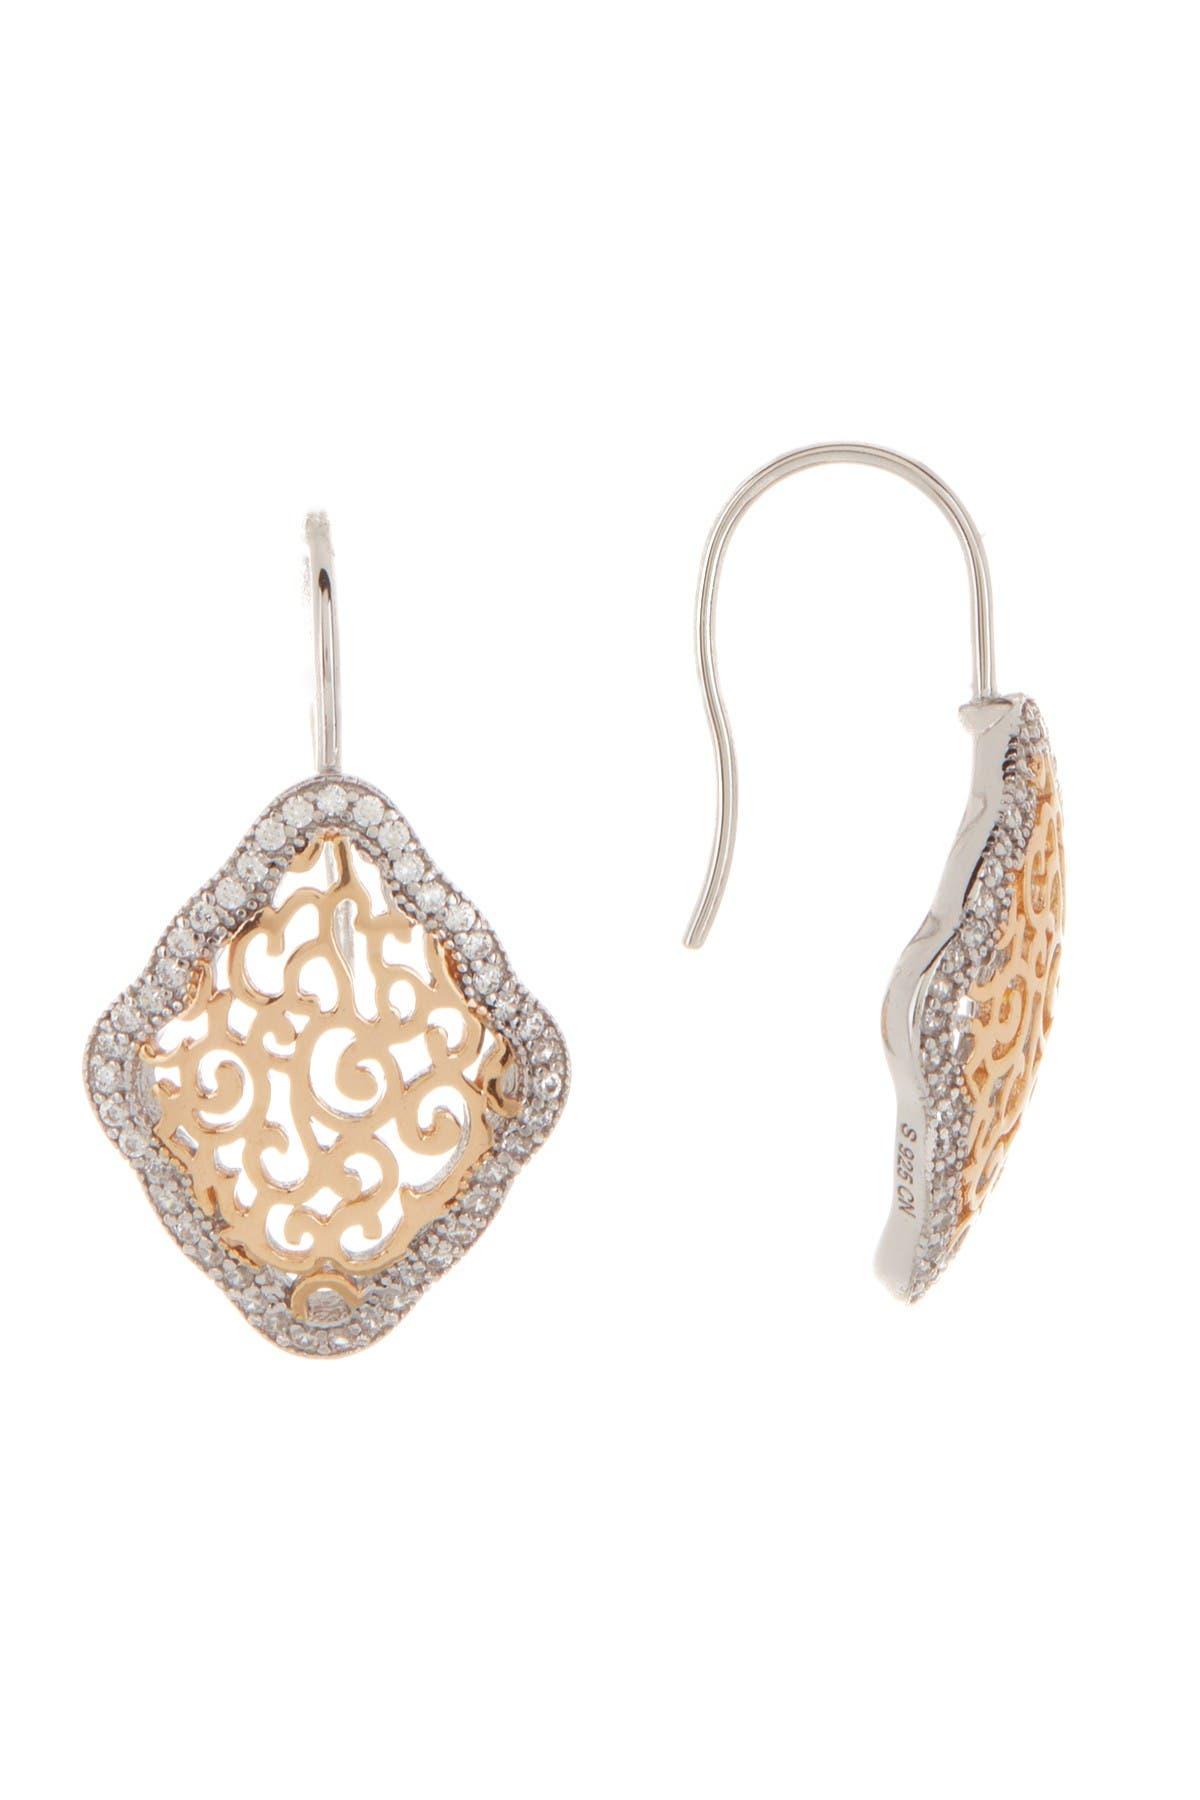 Image of Candela Two-Tone CZ Filigree Kite Dangle Earrings